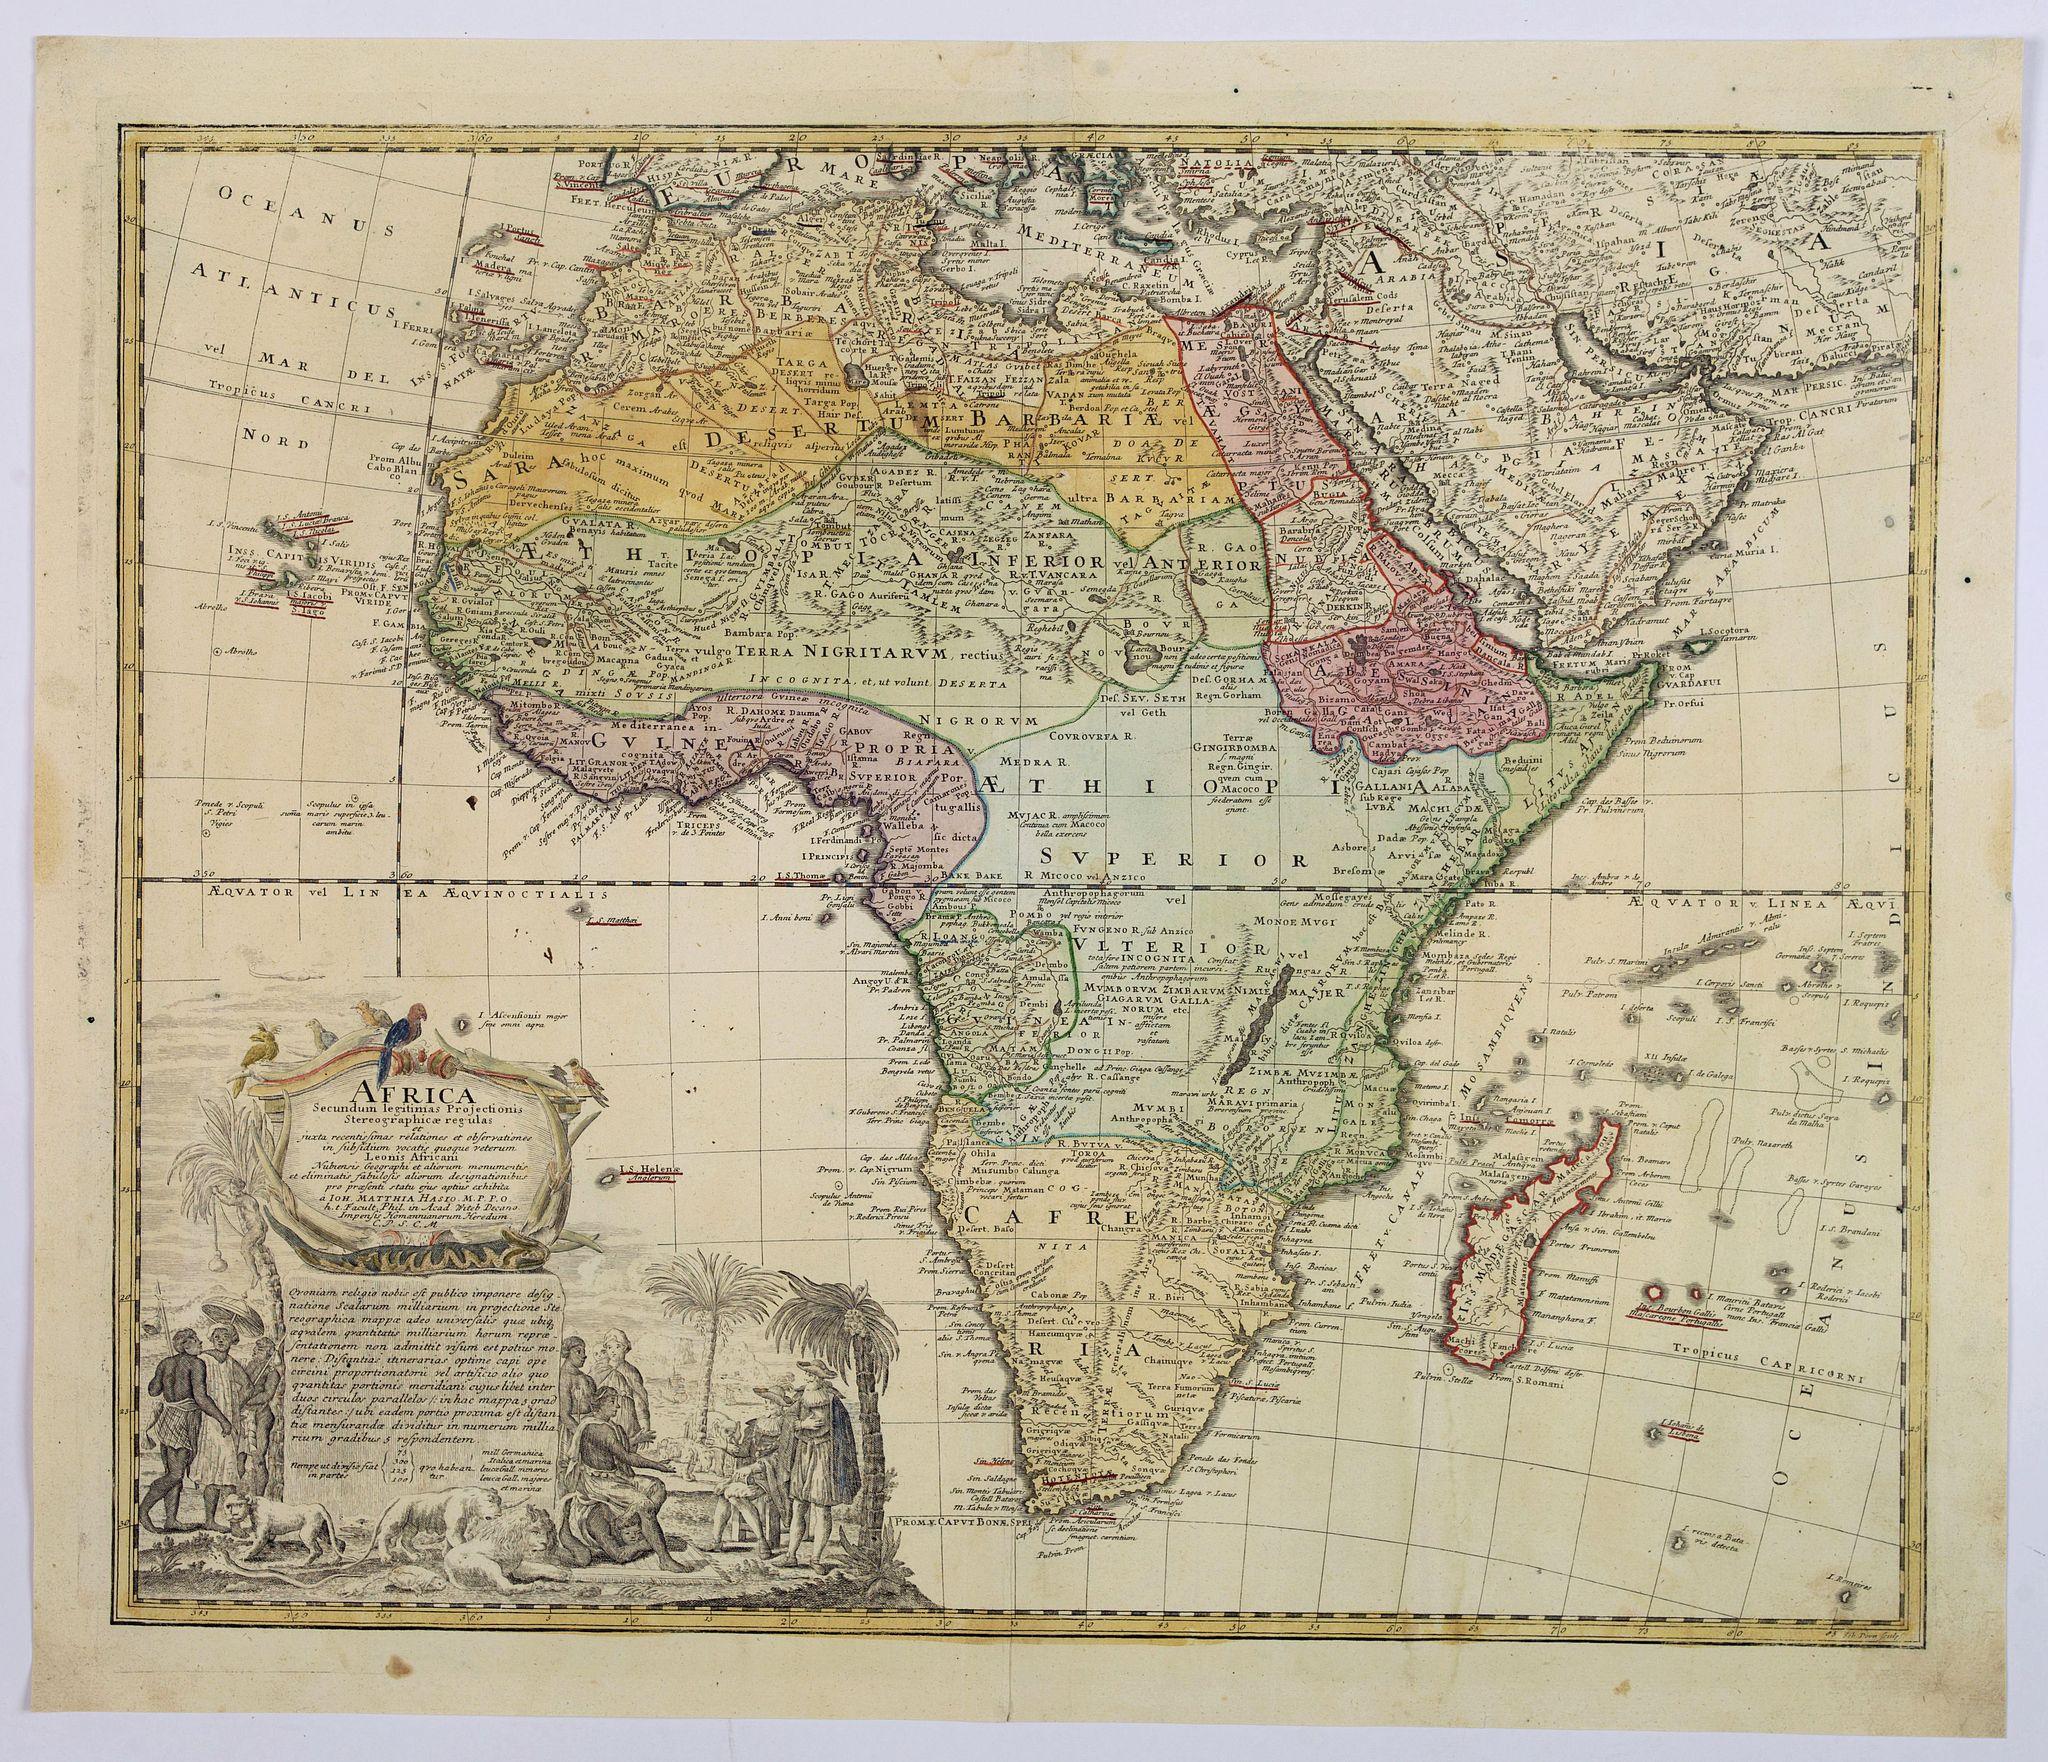 HAAS, J.M. / HOMANN HEIRS. -  Africa Secundum legitimas Projectionis Sterographicae regulas. . .